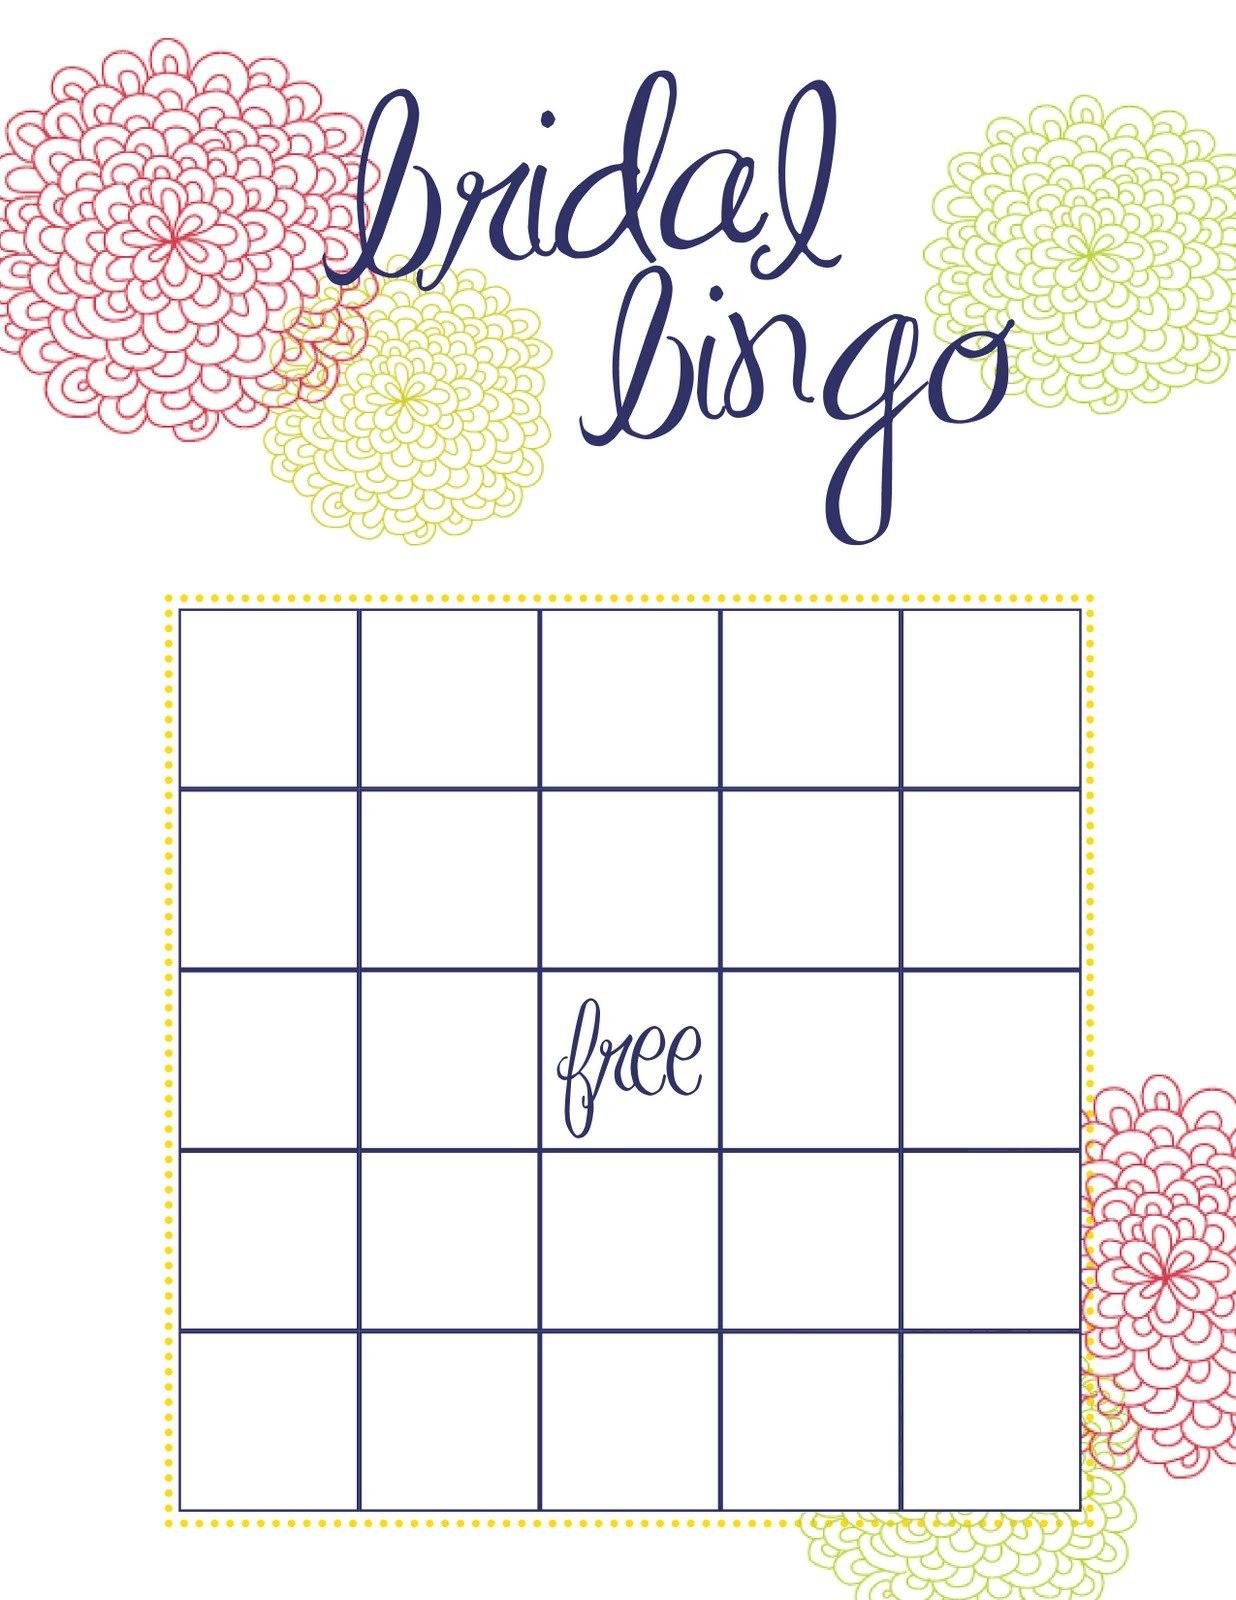 Photo  Baby Bingo Shower Blank Image Pertaining To Blank Bridal Shower Bingo Template